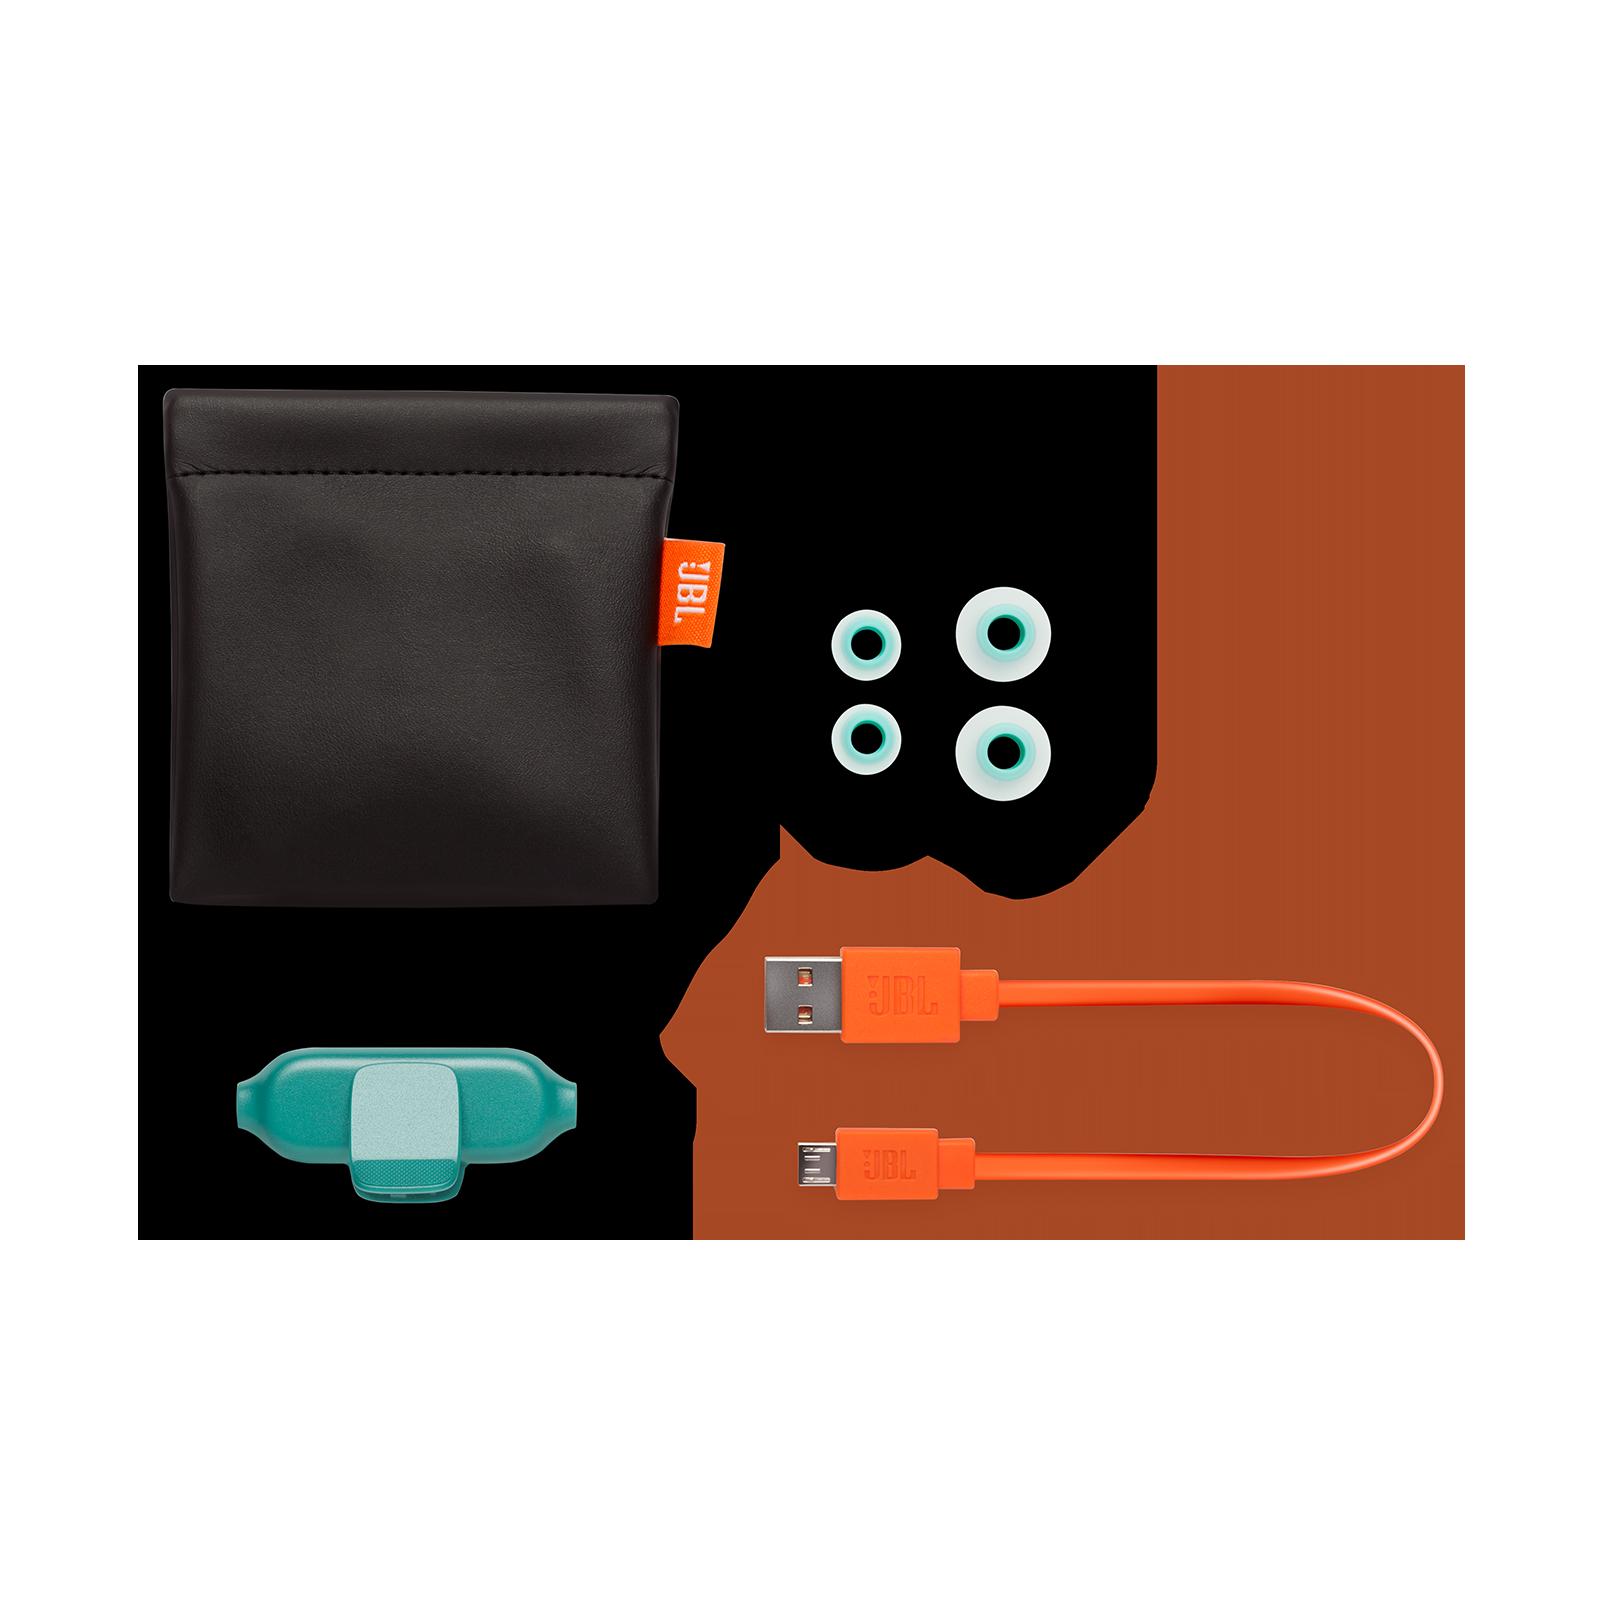 E25BT - Teal - Wireless in-ear headphones - Detailshot 4